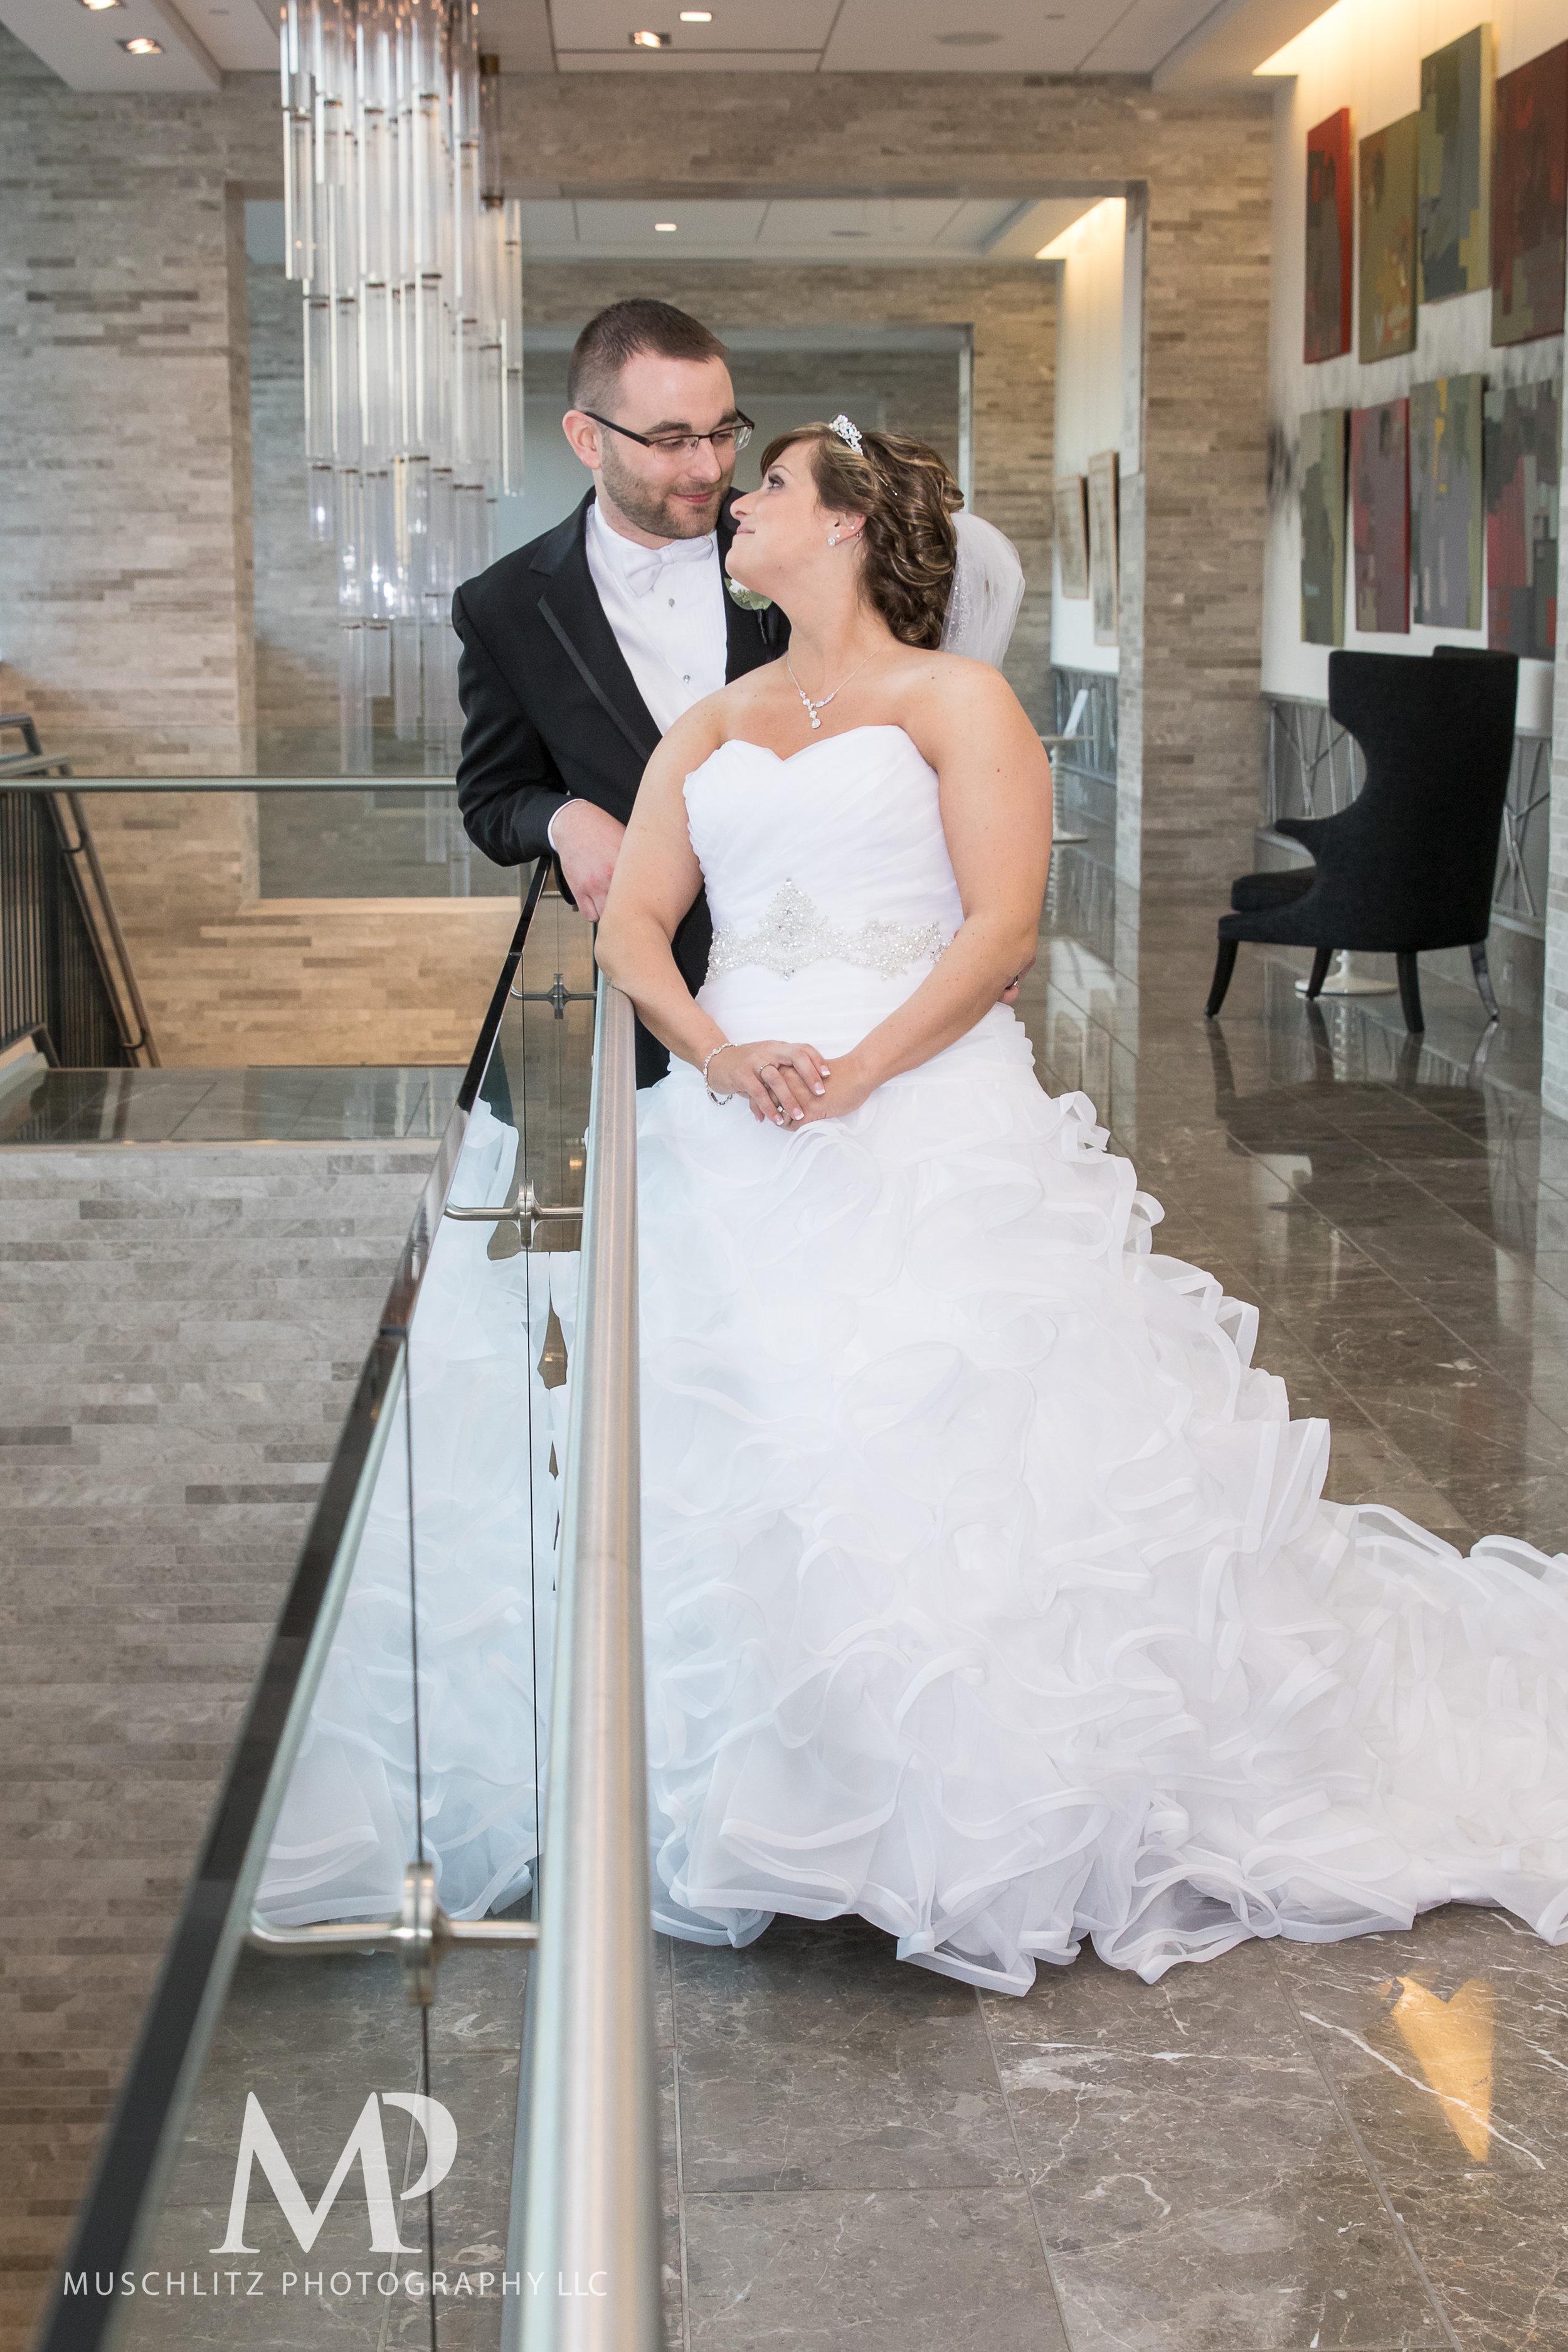 the hilton-columbus-wedding-portraits-downtown-columbus-ohio-muschlitz-photography-007.JPG